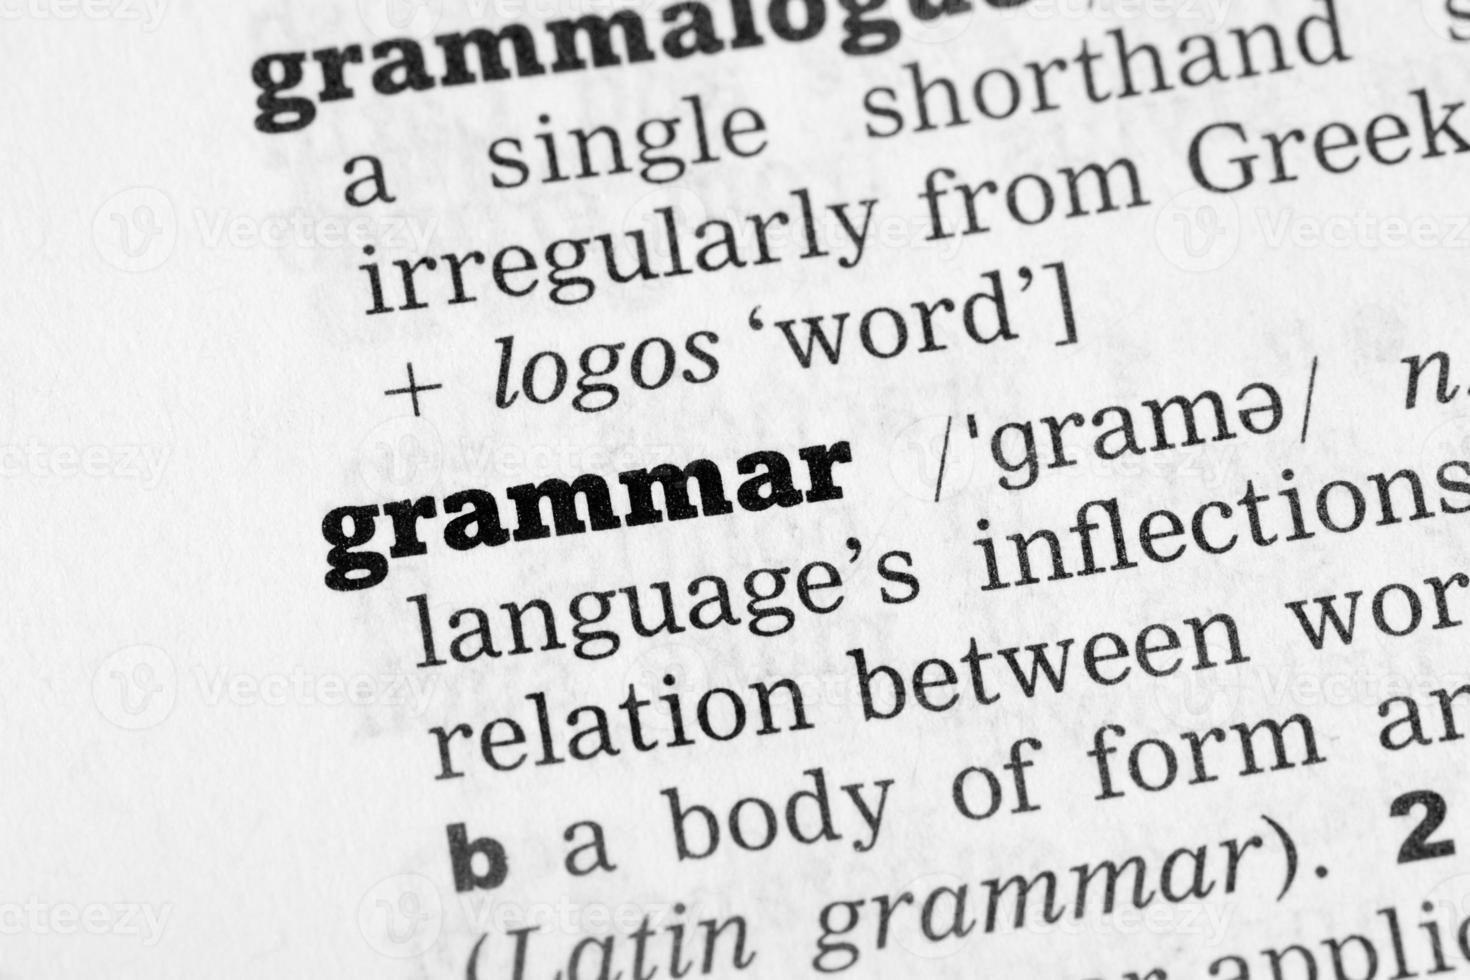 grammatica woordenboekdefinitie foto